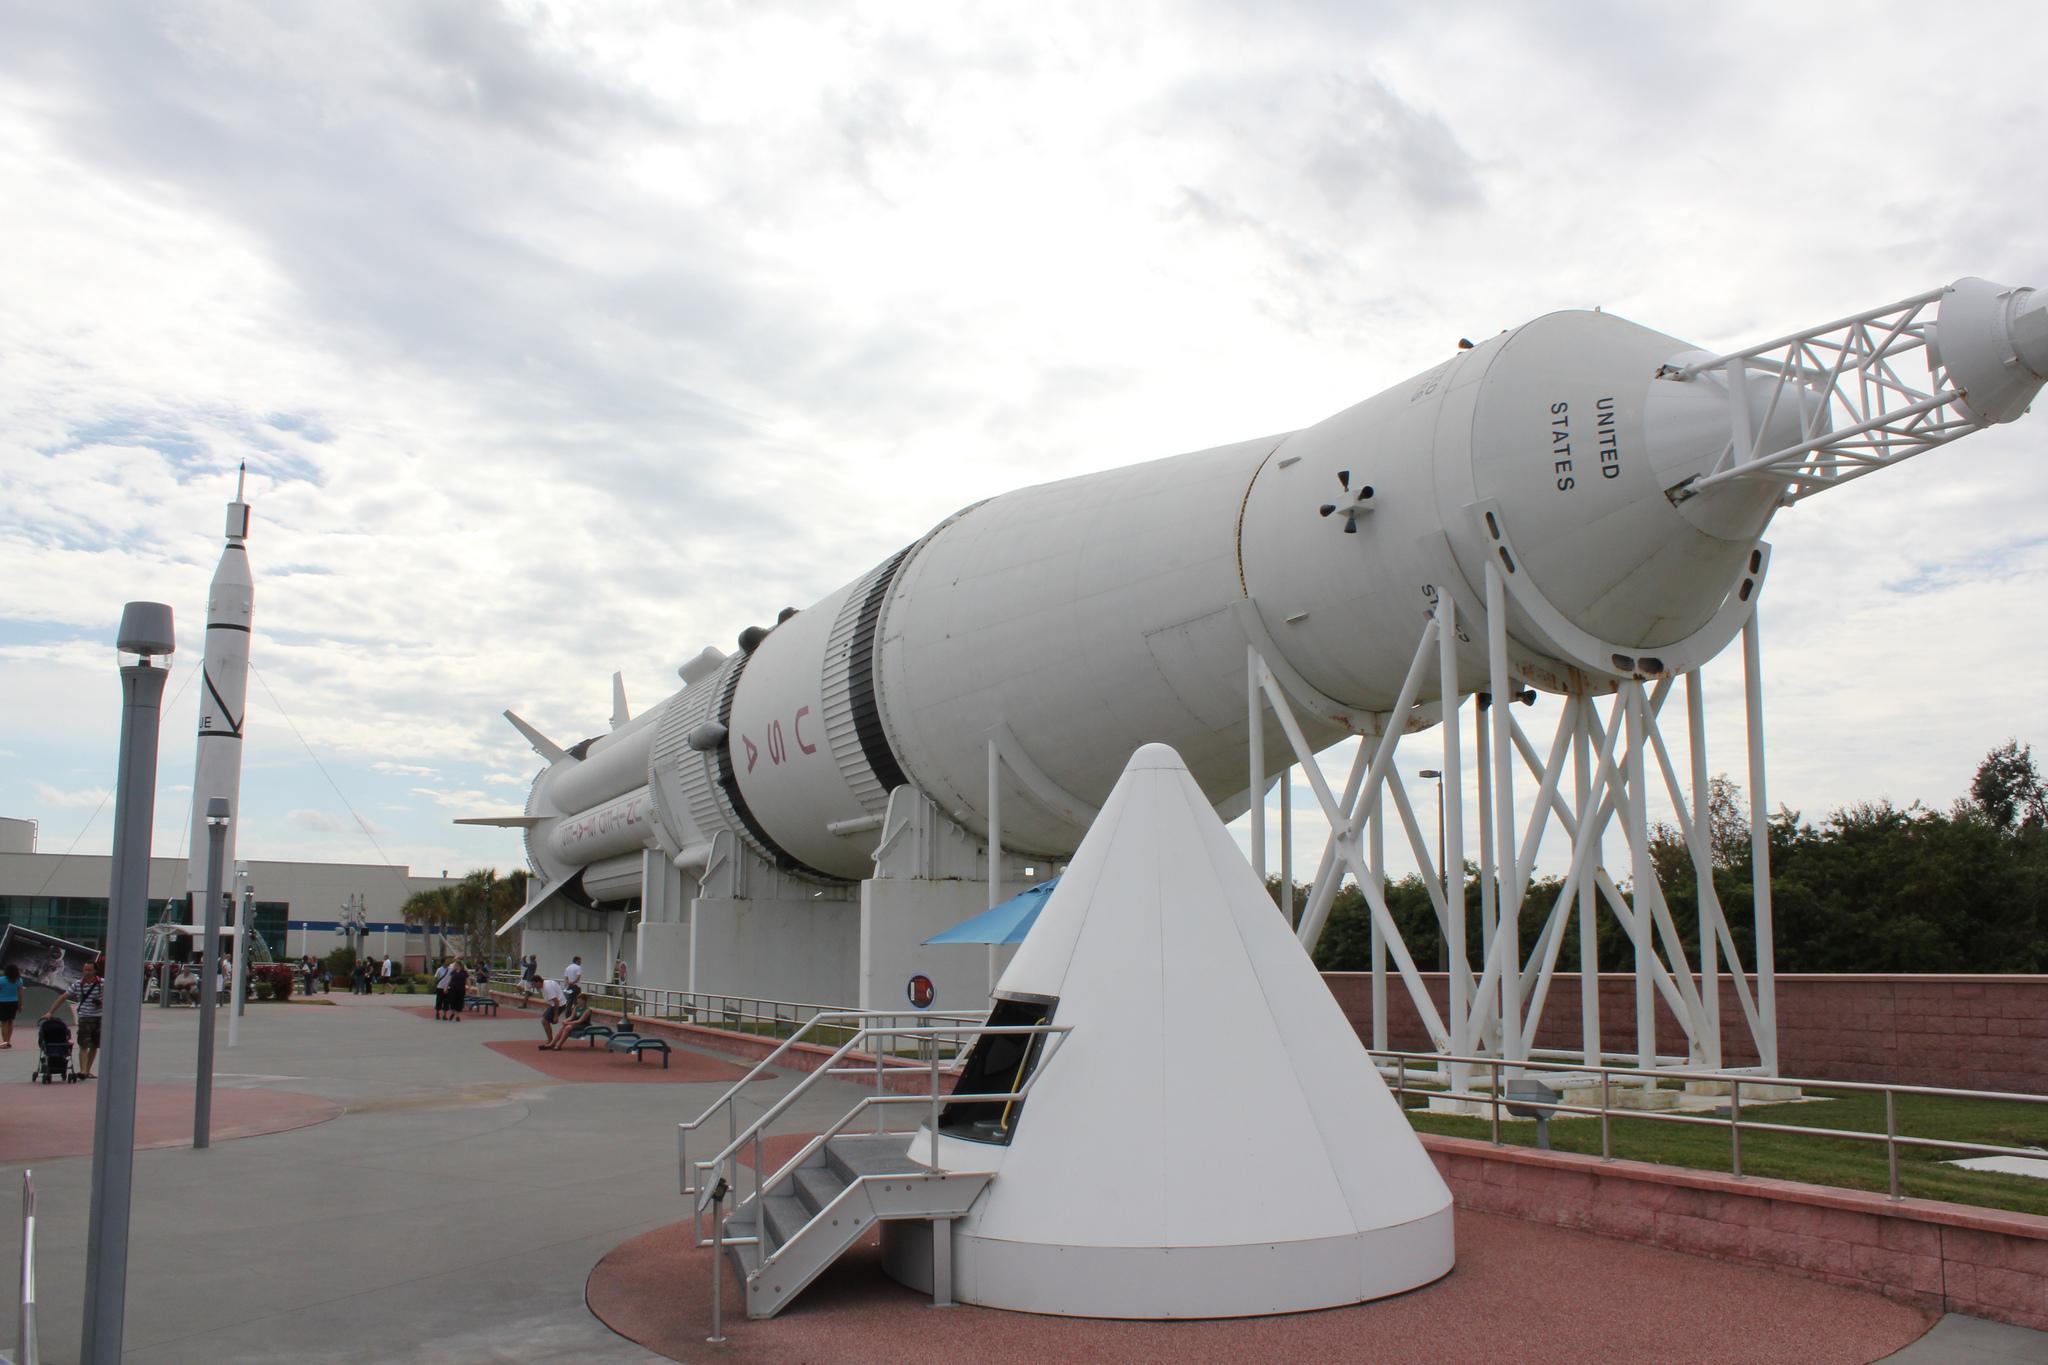 На территории Космического центра Кеннеди